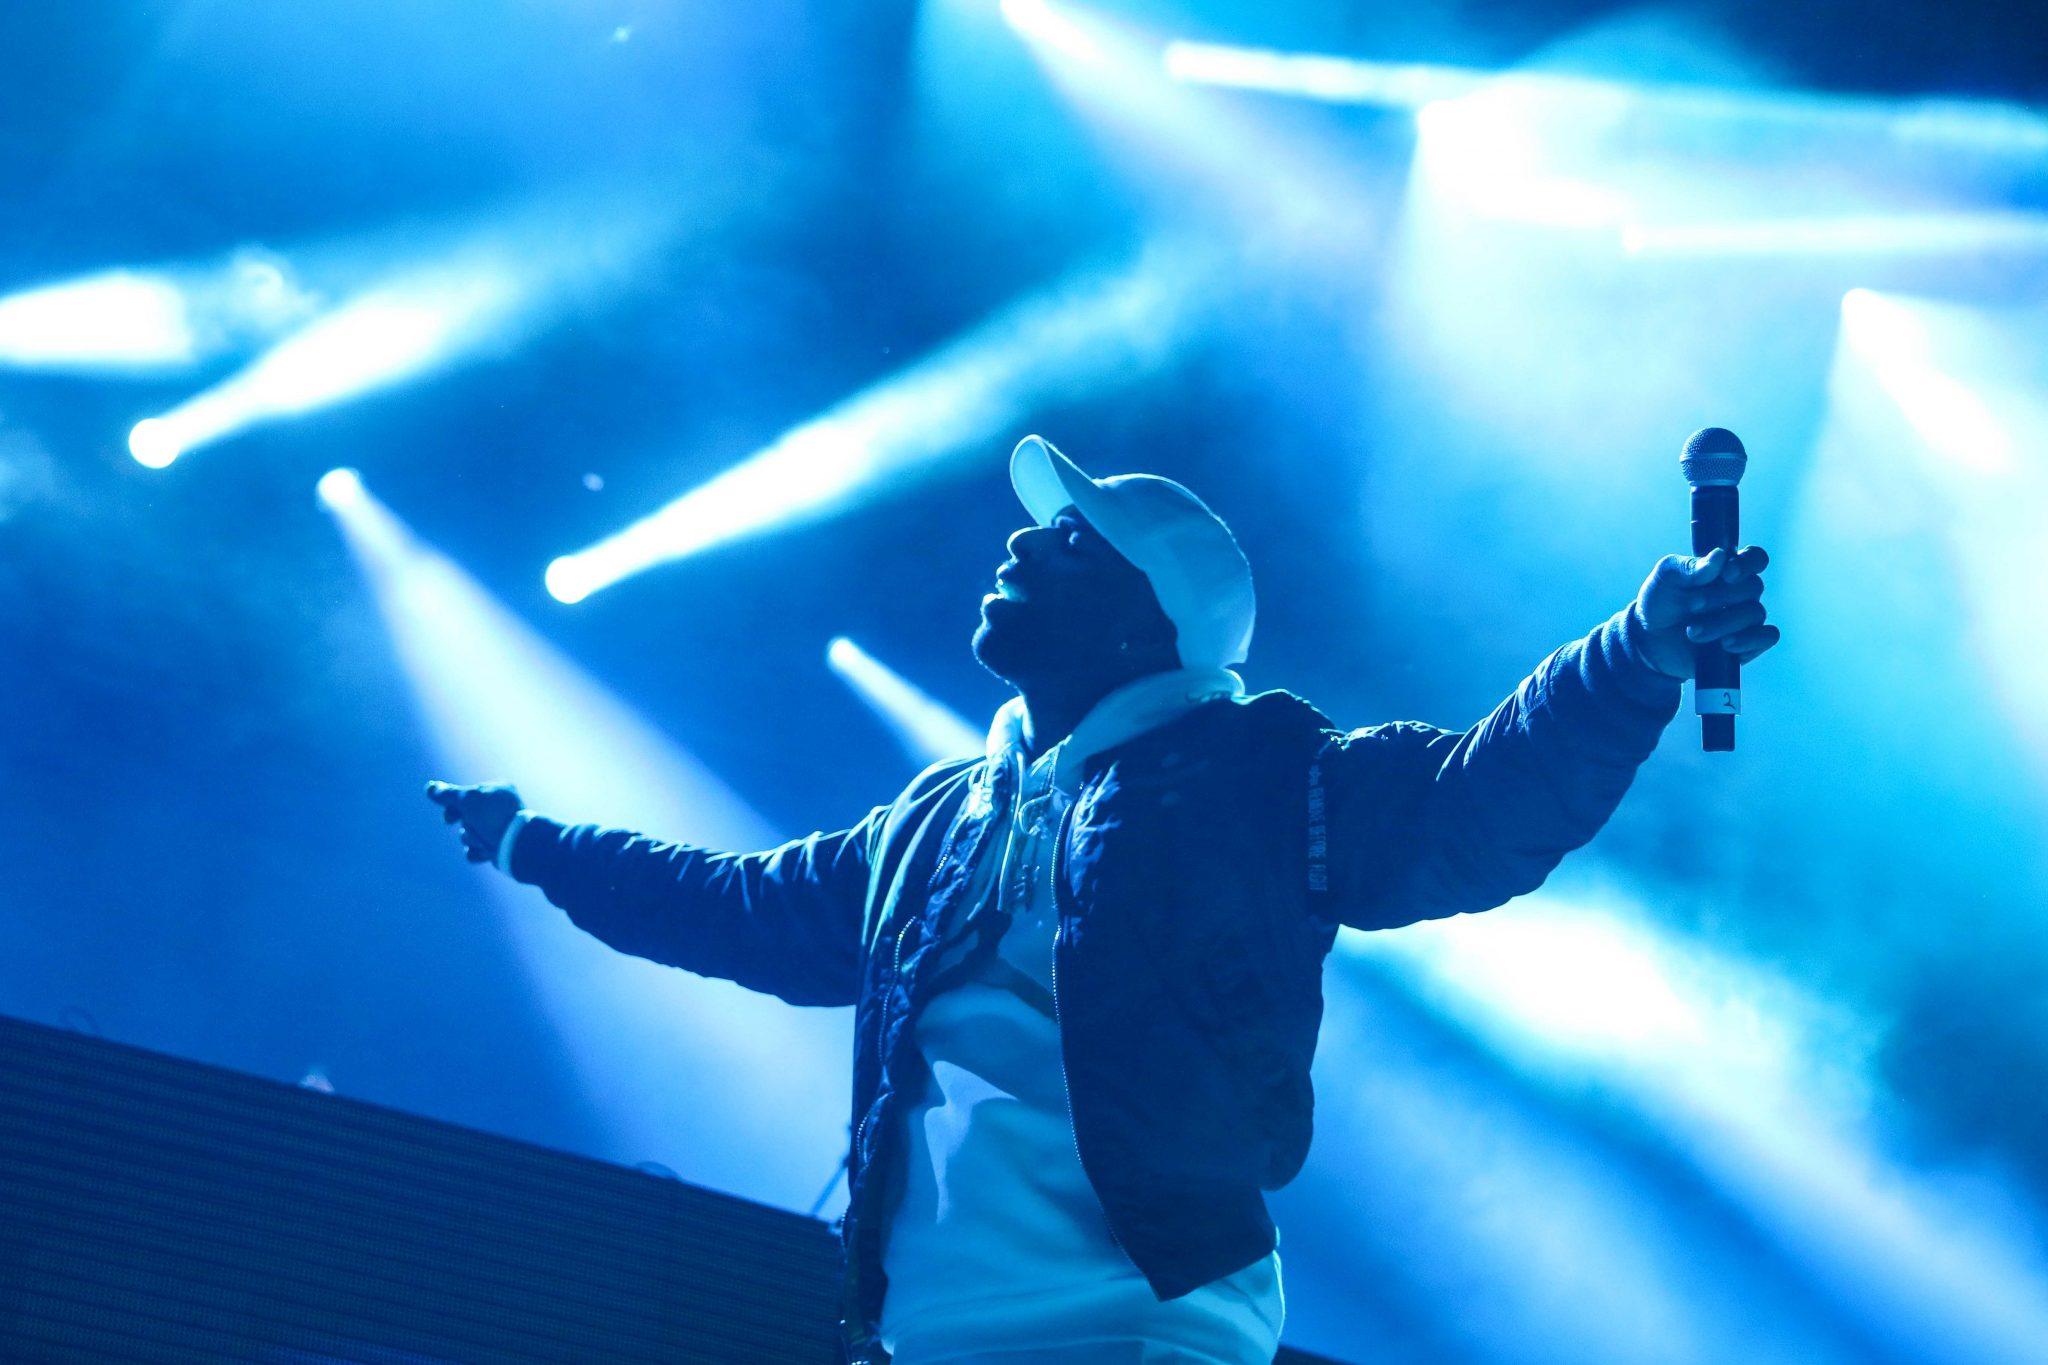 Toronto's Daniel Daley, DVSN, performs on stage in Toronto. Photo taken by Luke Galati.